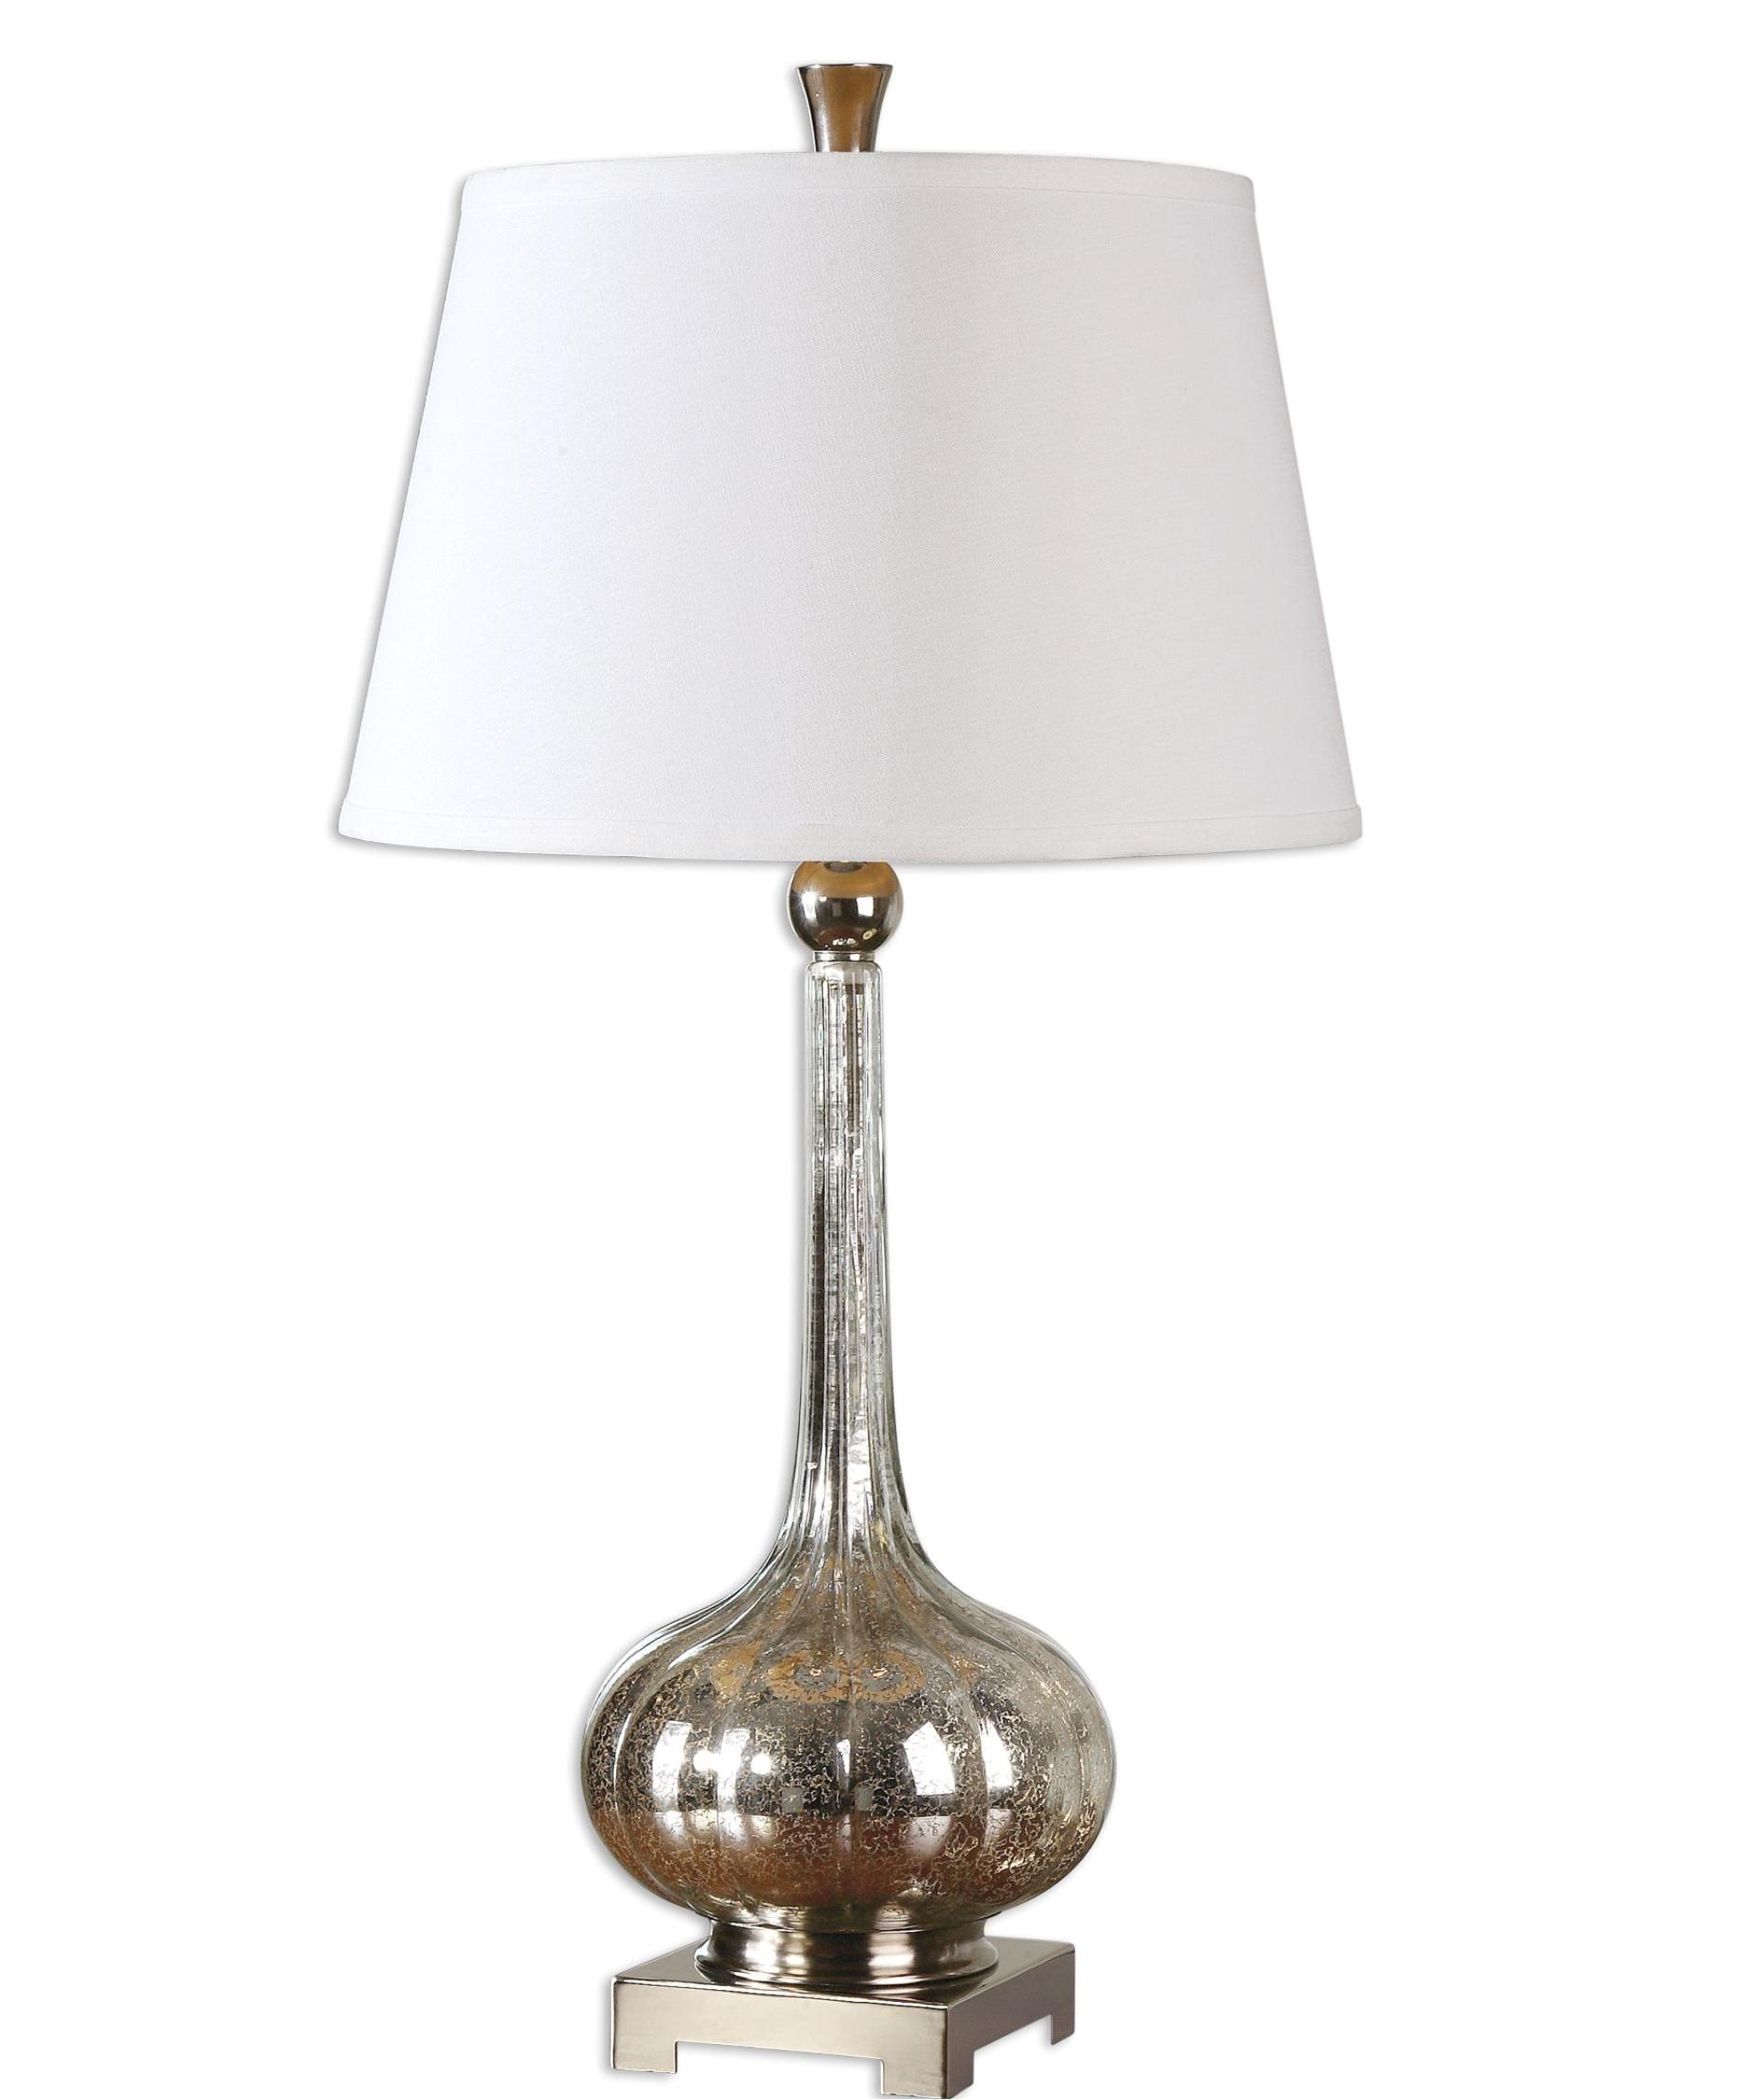 uttermost 26494 oristano 33 inch table lamp